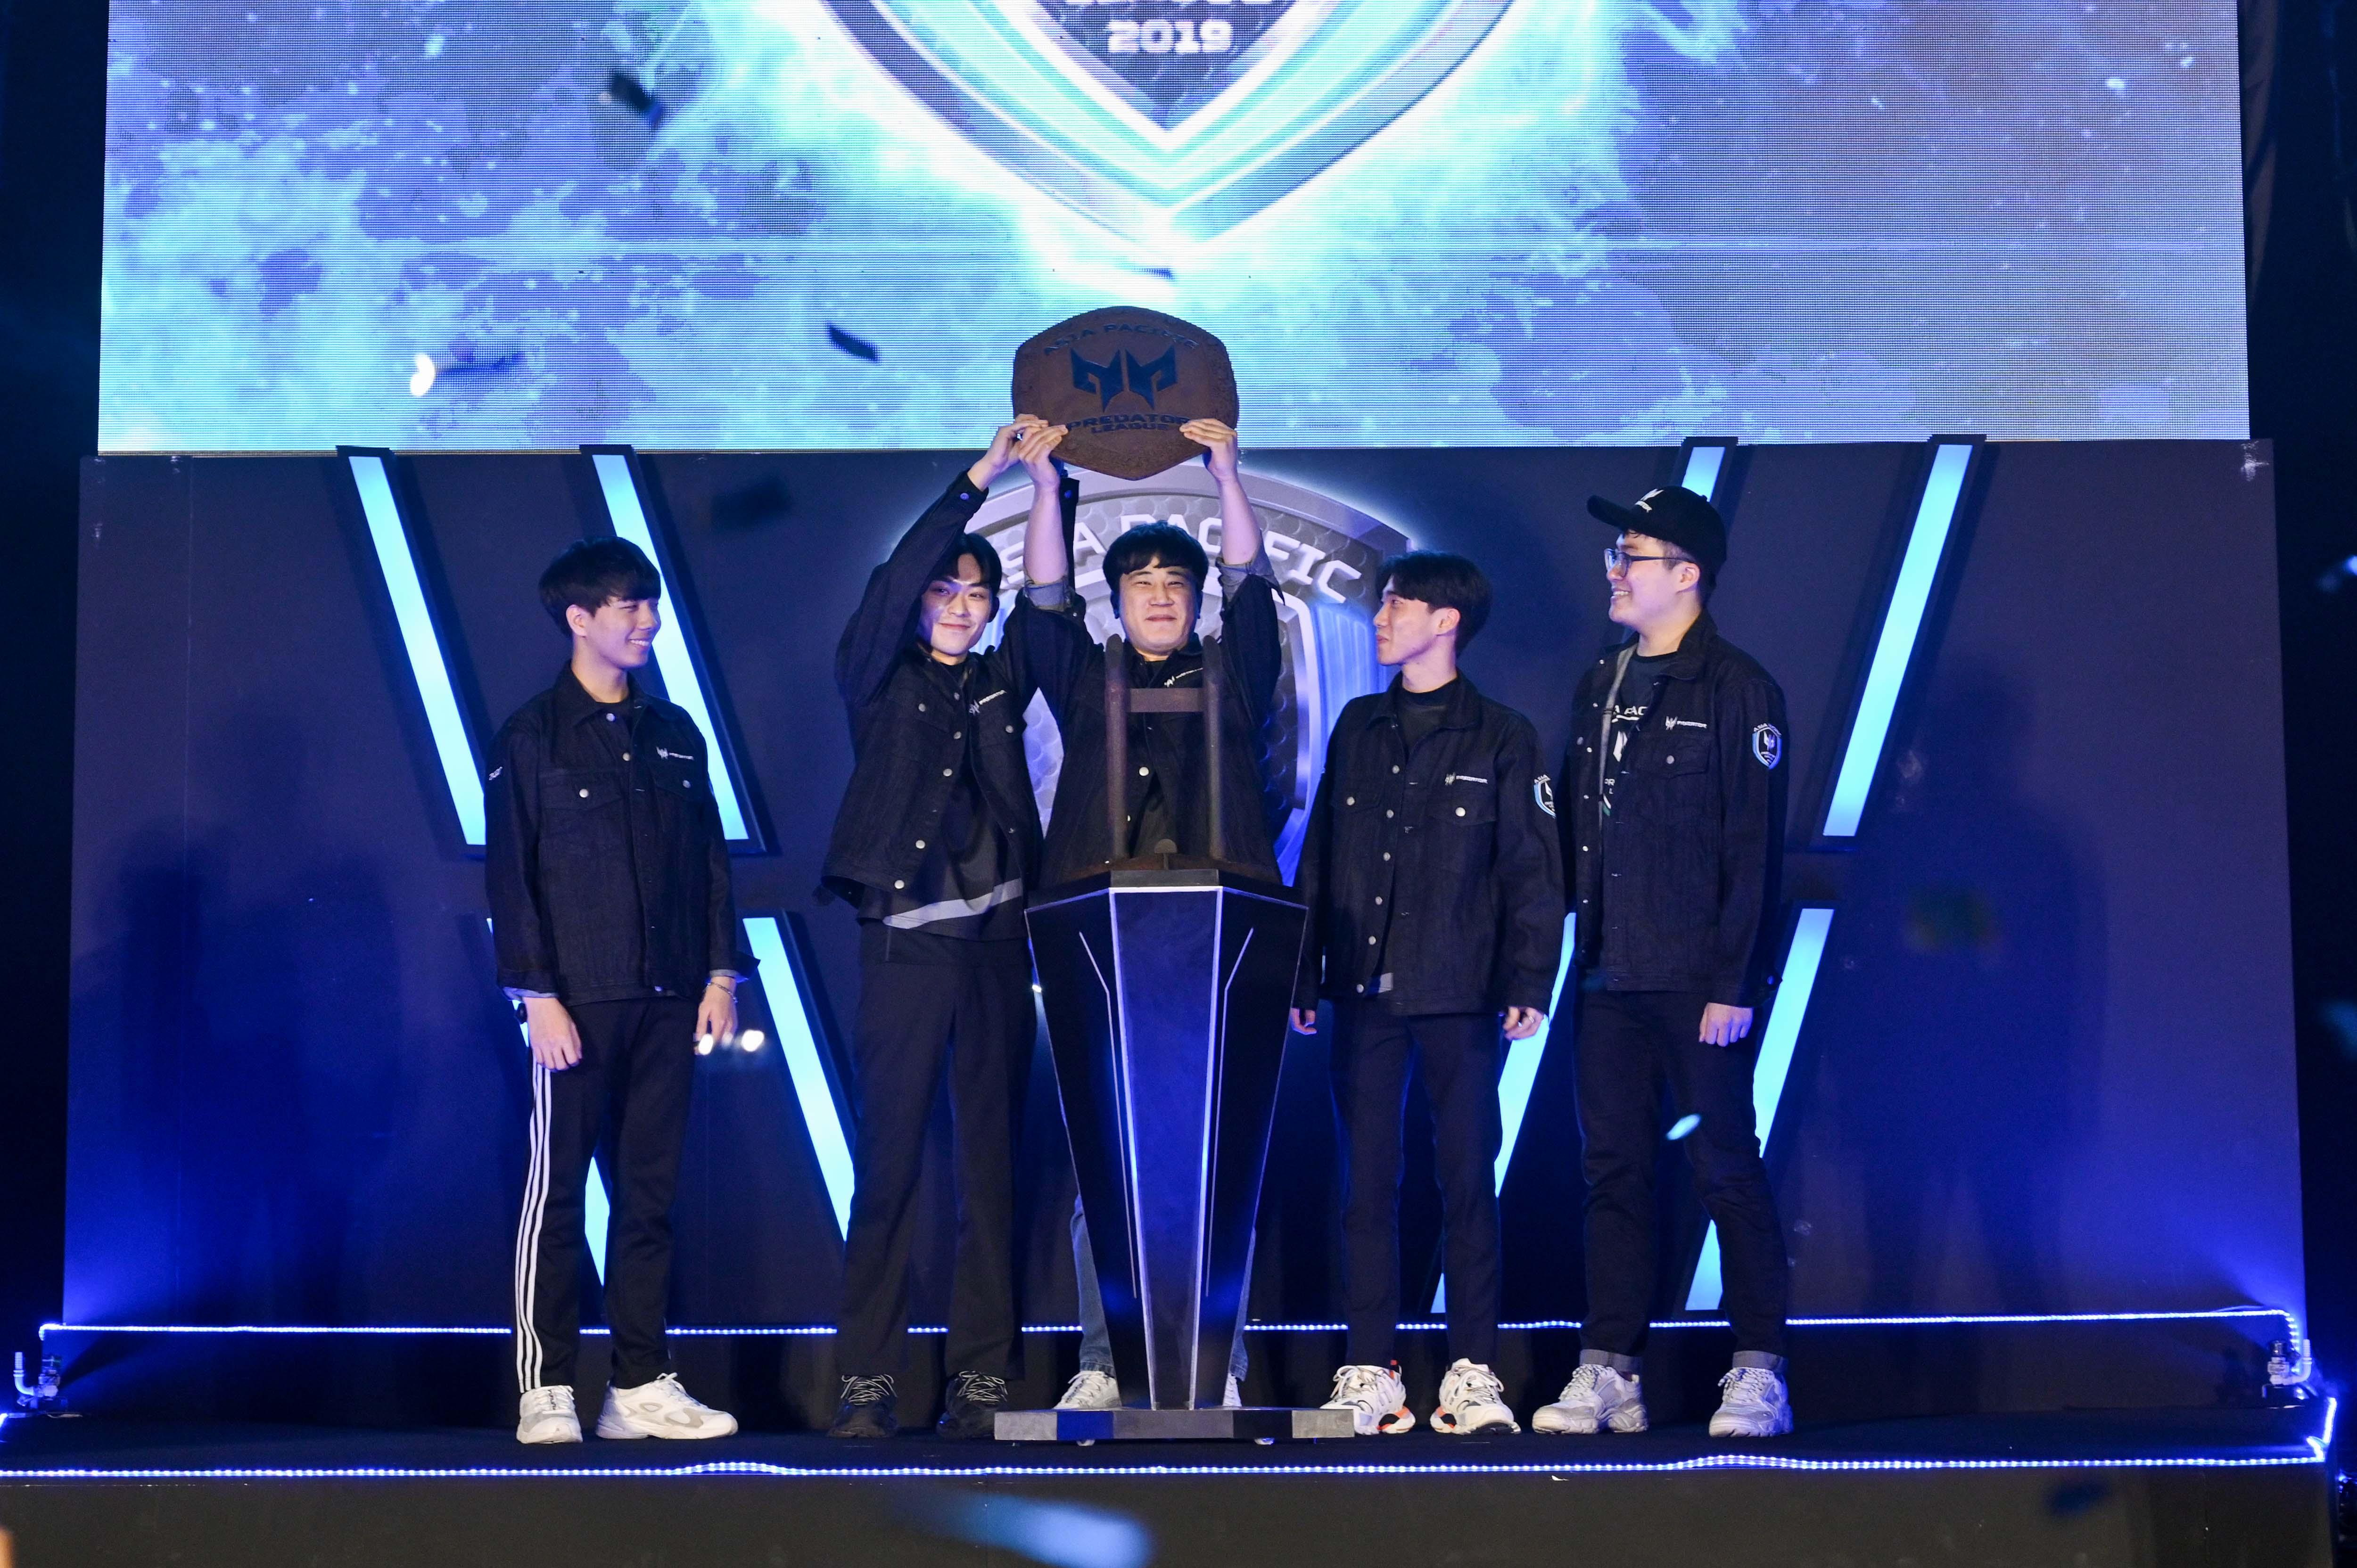 01 dsc 3494 17 02 19 บรรยากาศงาน Asia Pacific Predator League 2019 สุดยอดขุนพลทีมอีสปอร์ตเข้าร่วมการแข่งขันรอบแกรนด์ไฟนอล